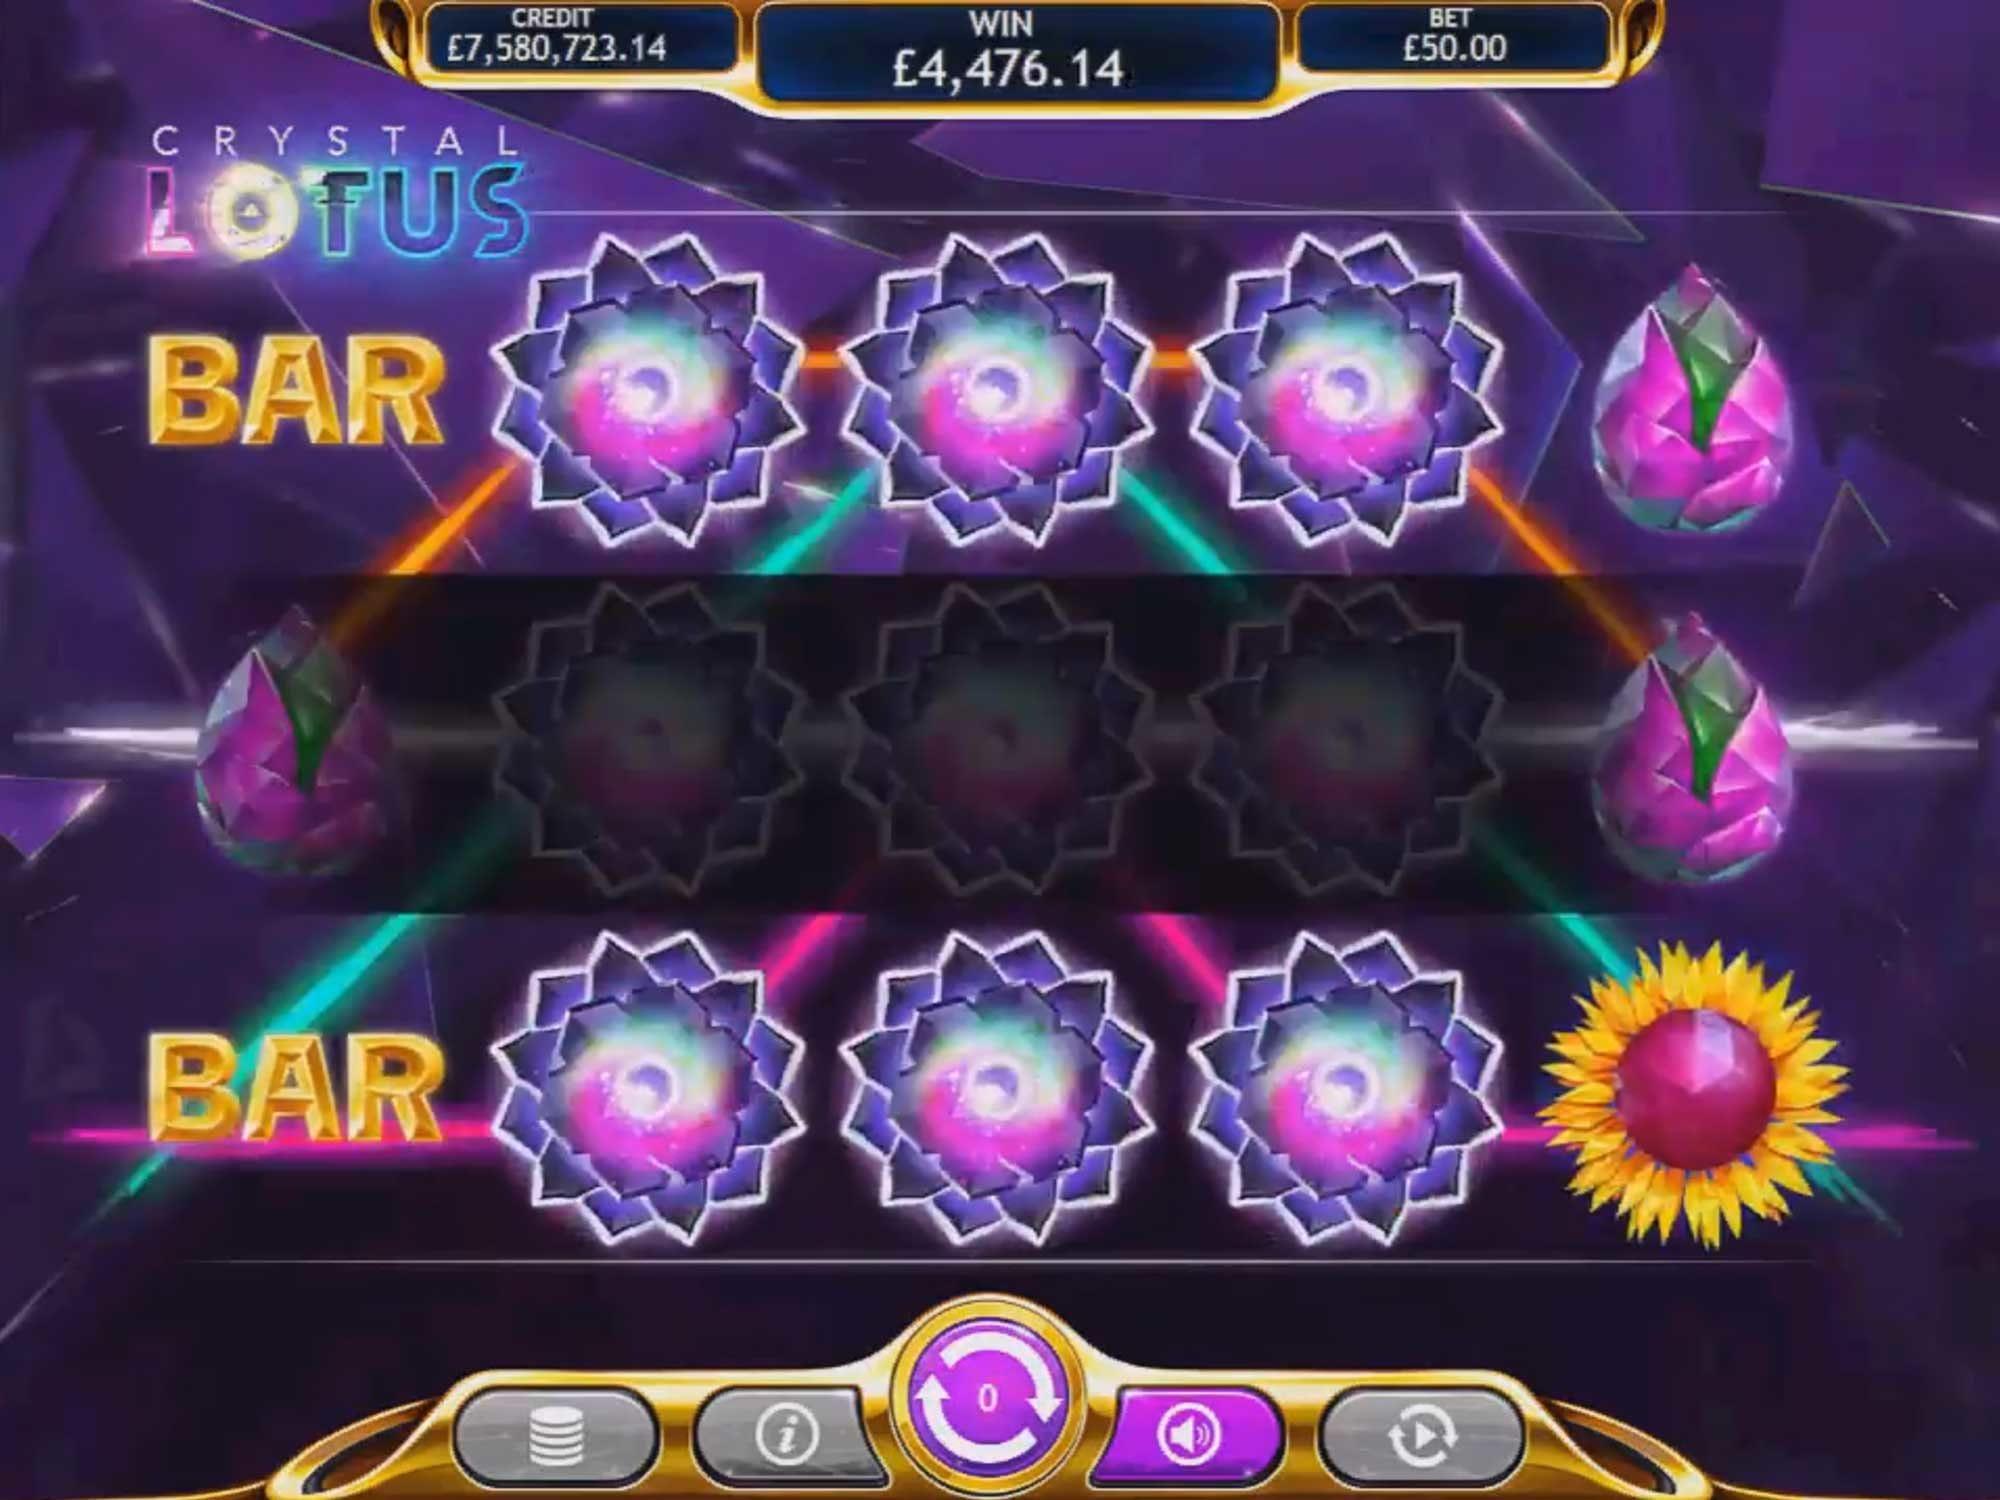 Crystal Lotus Casino Gameplay